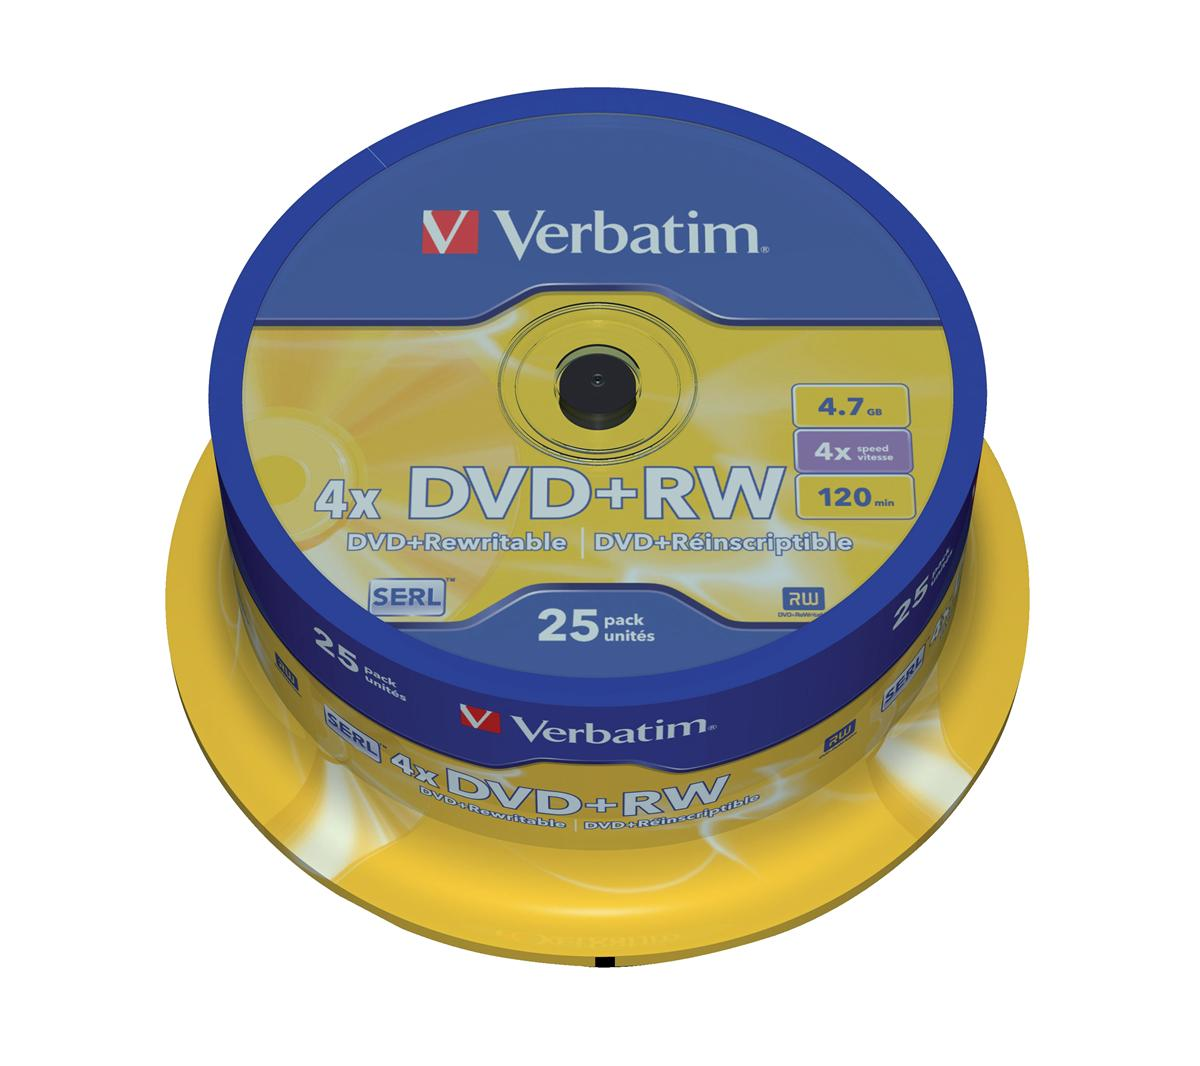 Image for Verbatim DVD+RW Rewritable Disk Spindle 1x-4x Speed 120min 4.7Gb Ref 43489 [Pack 25]